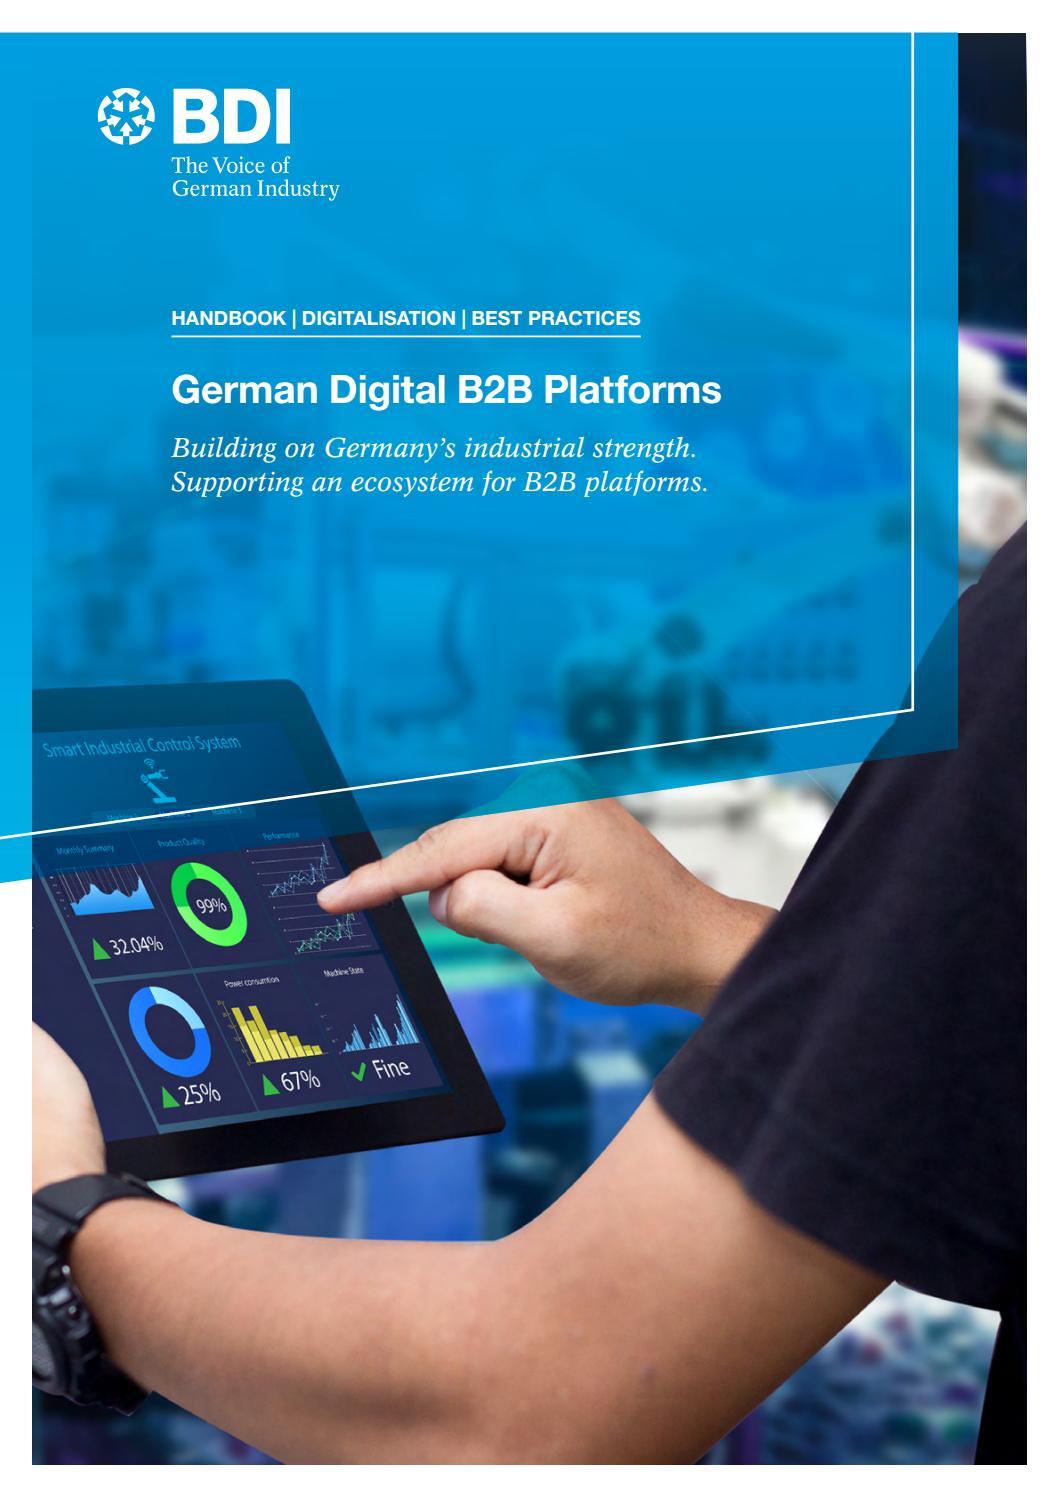 german digital b2b platforms by